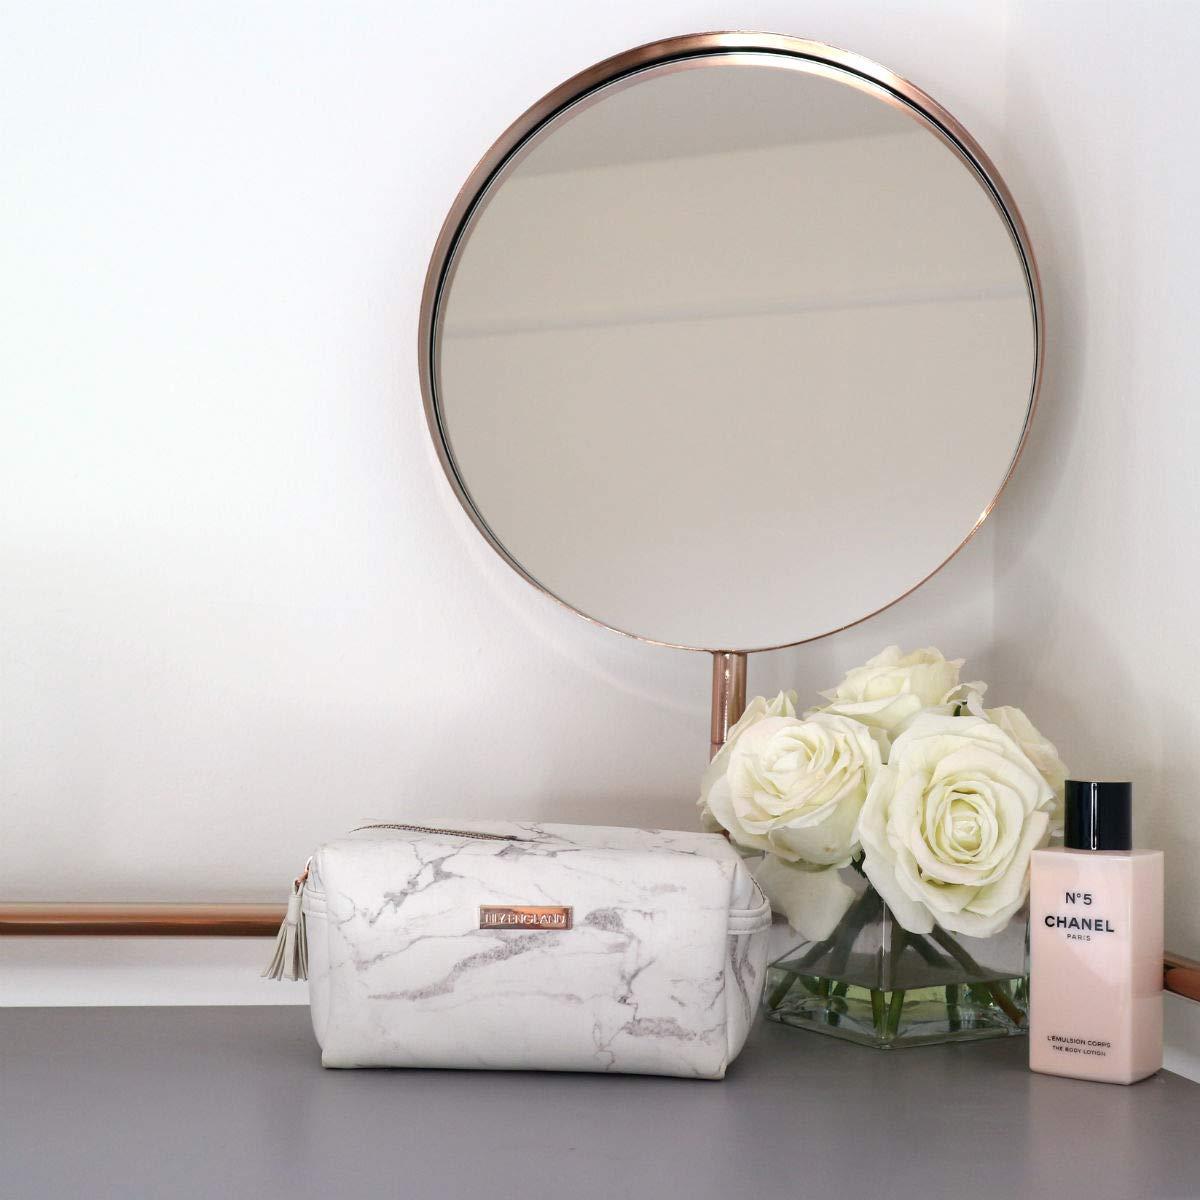 Lily England Bolsa de Maquillaje de Mármol - Bolsa de Cosméticos, Neceser o Estuche Escolar: Amazon.es: Equipaje